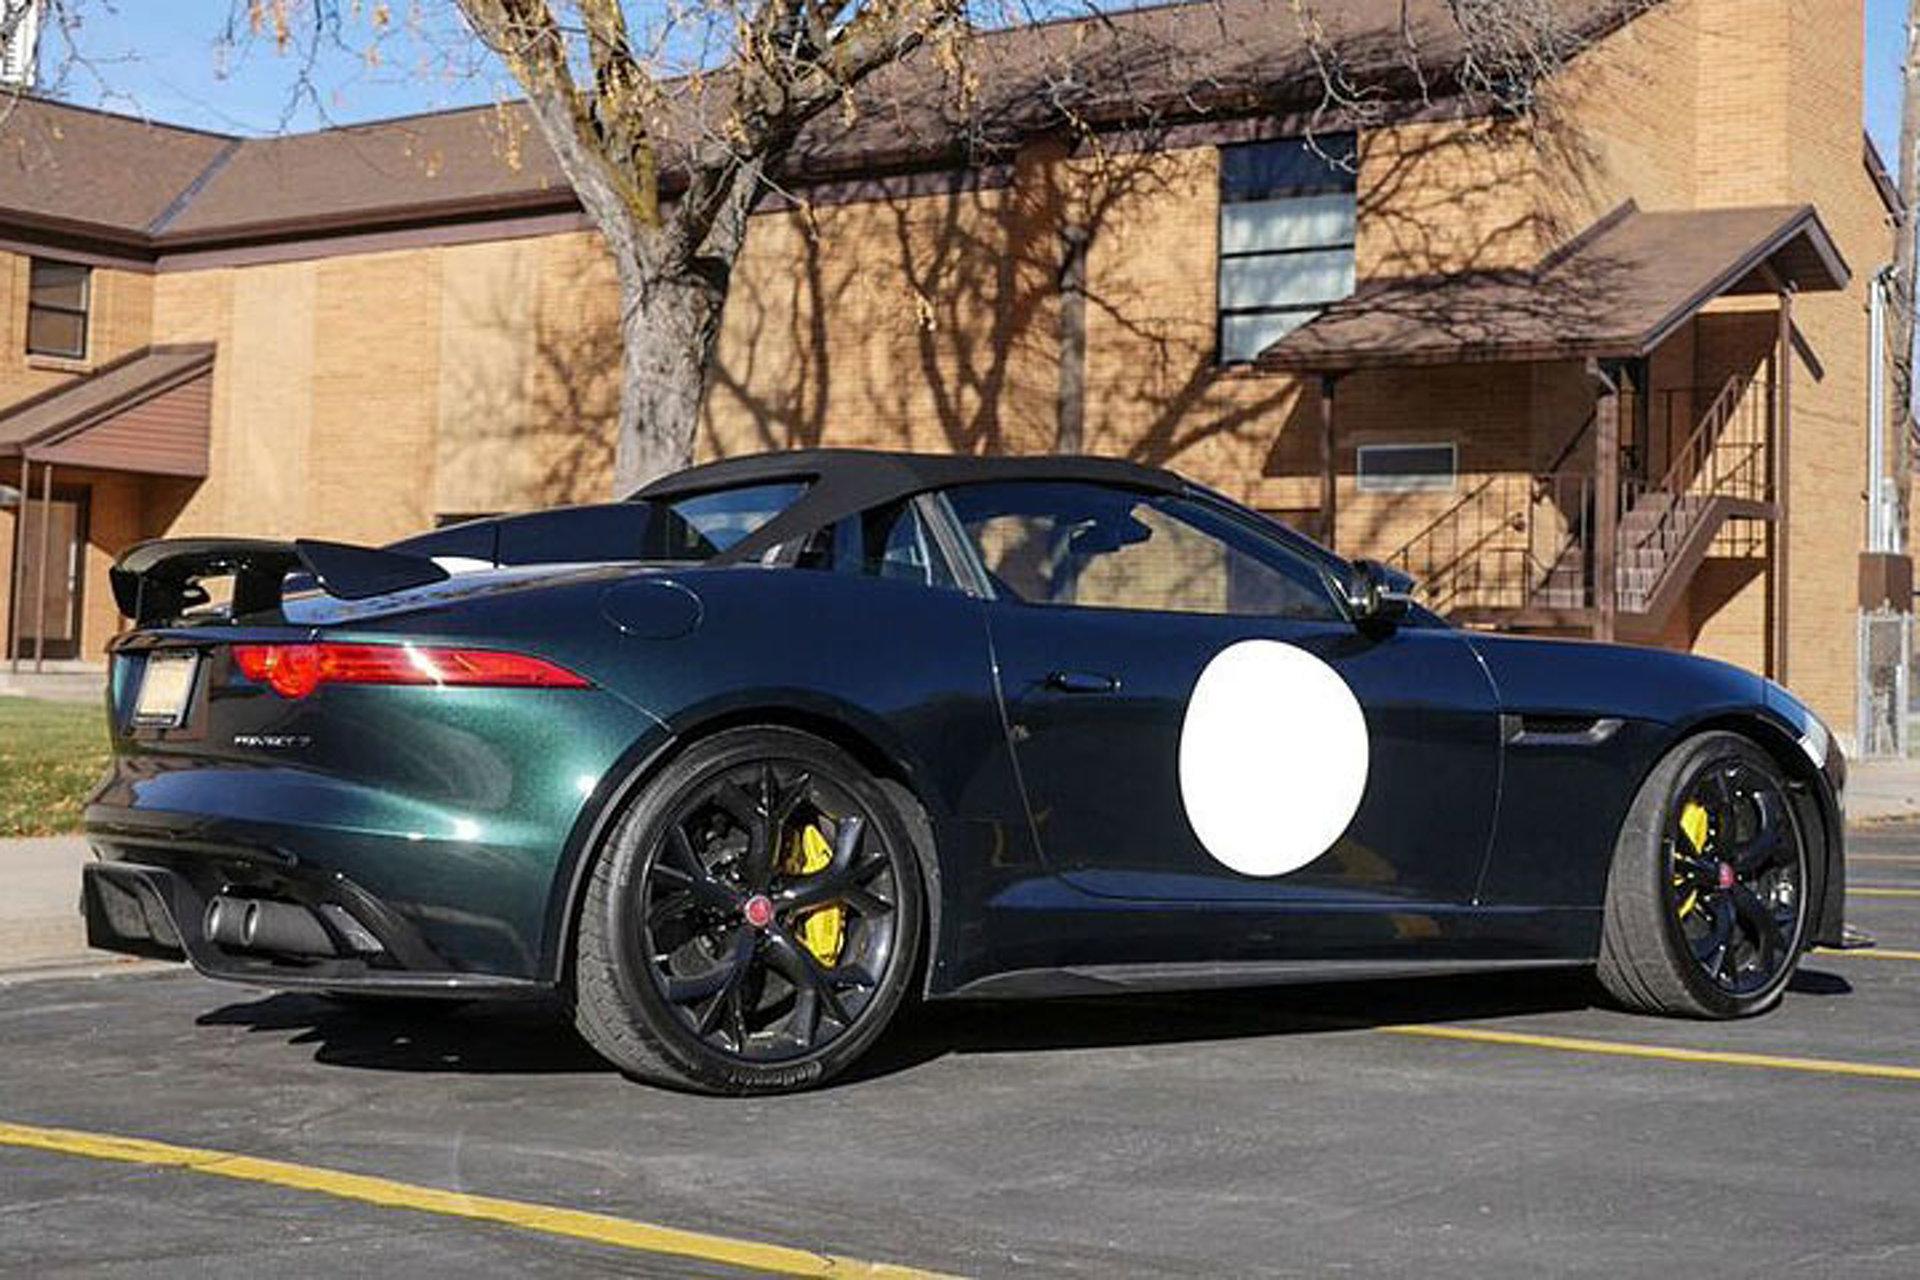 Rare 1-of-250 Jaguar F-Type Project 7 Roars onto eBay